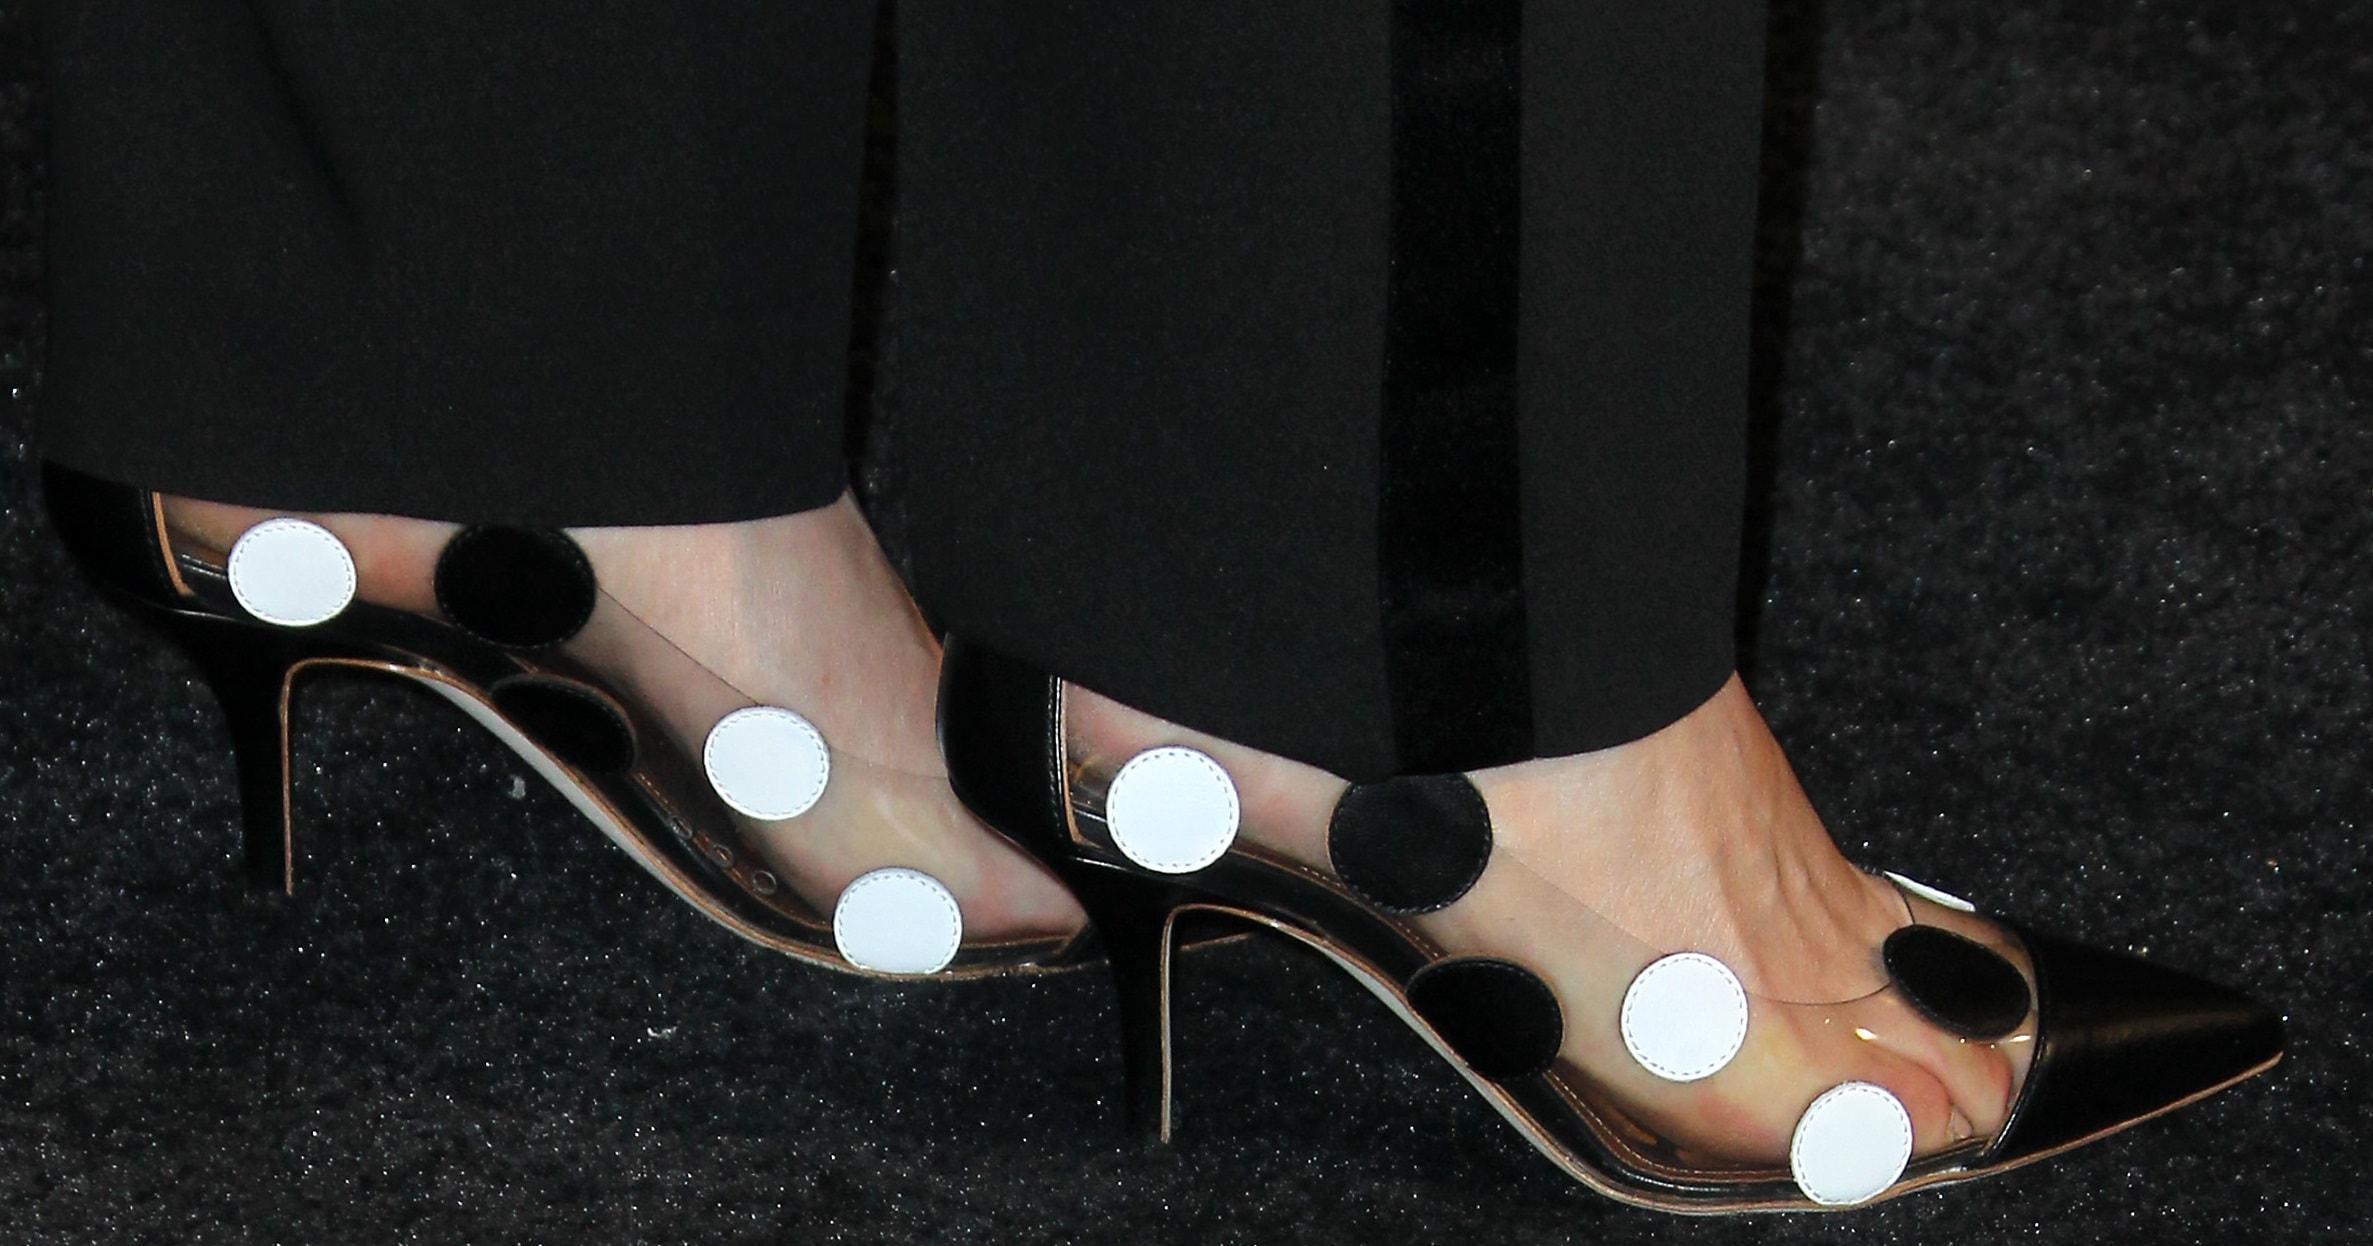 America Ferrera Naked Pics america ferrera's nude legs & feet in sexy high heels